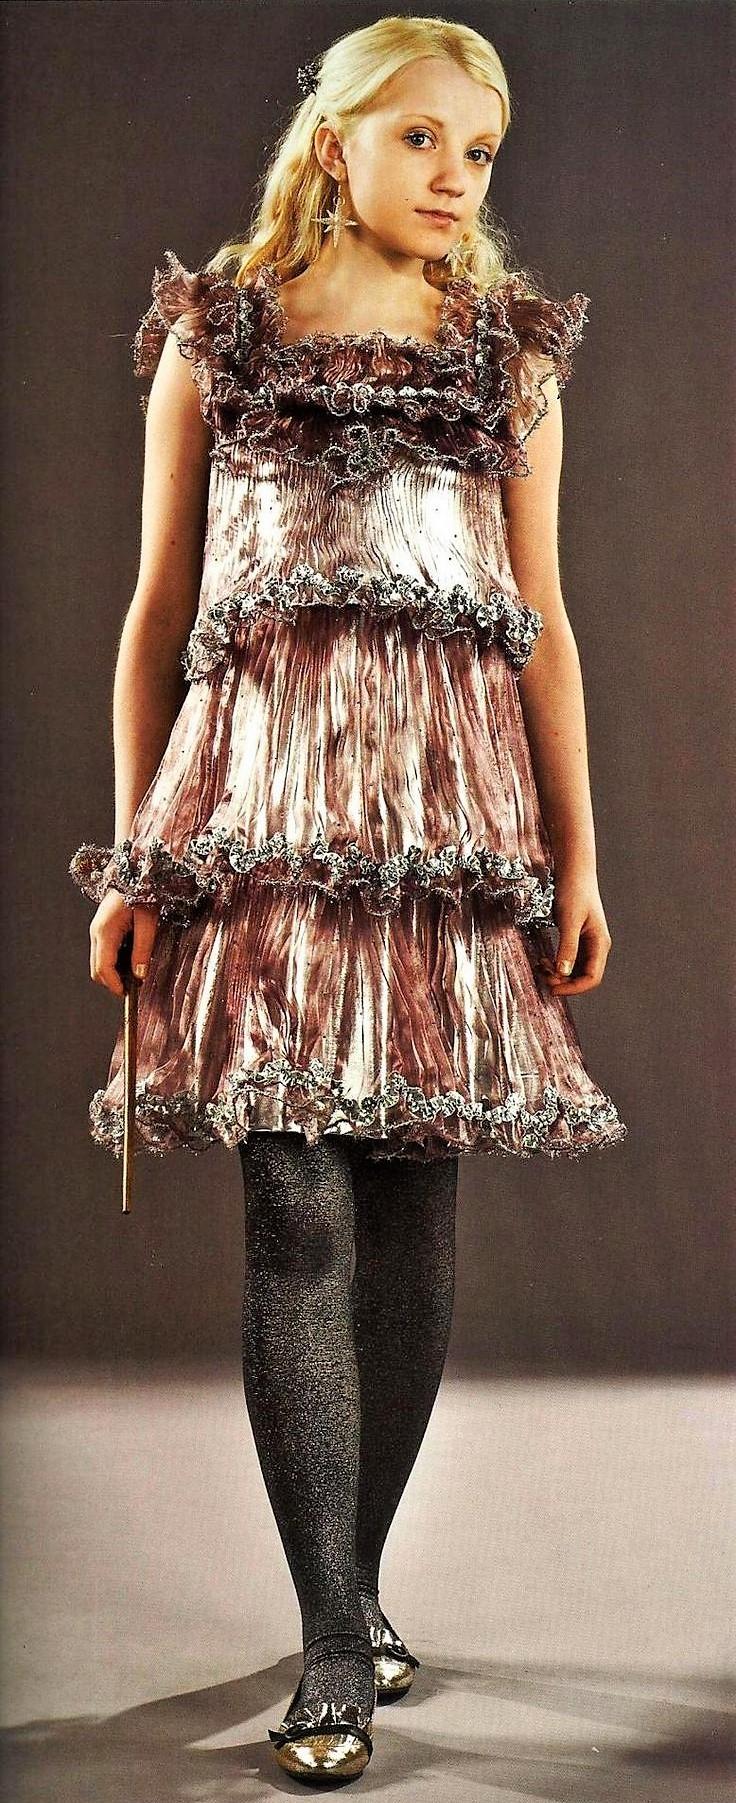 File:Luna party robes.jpg